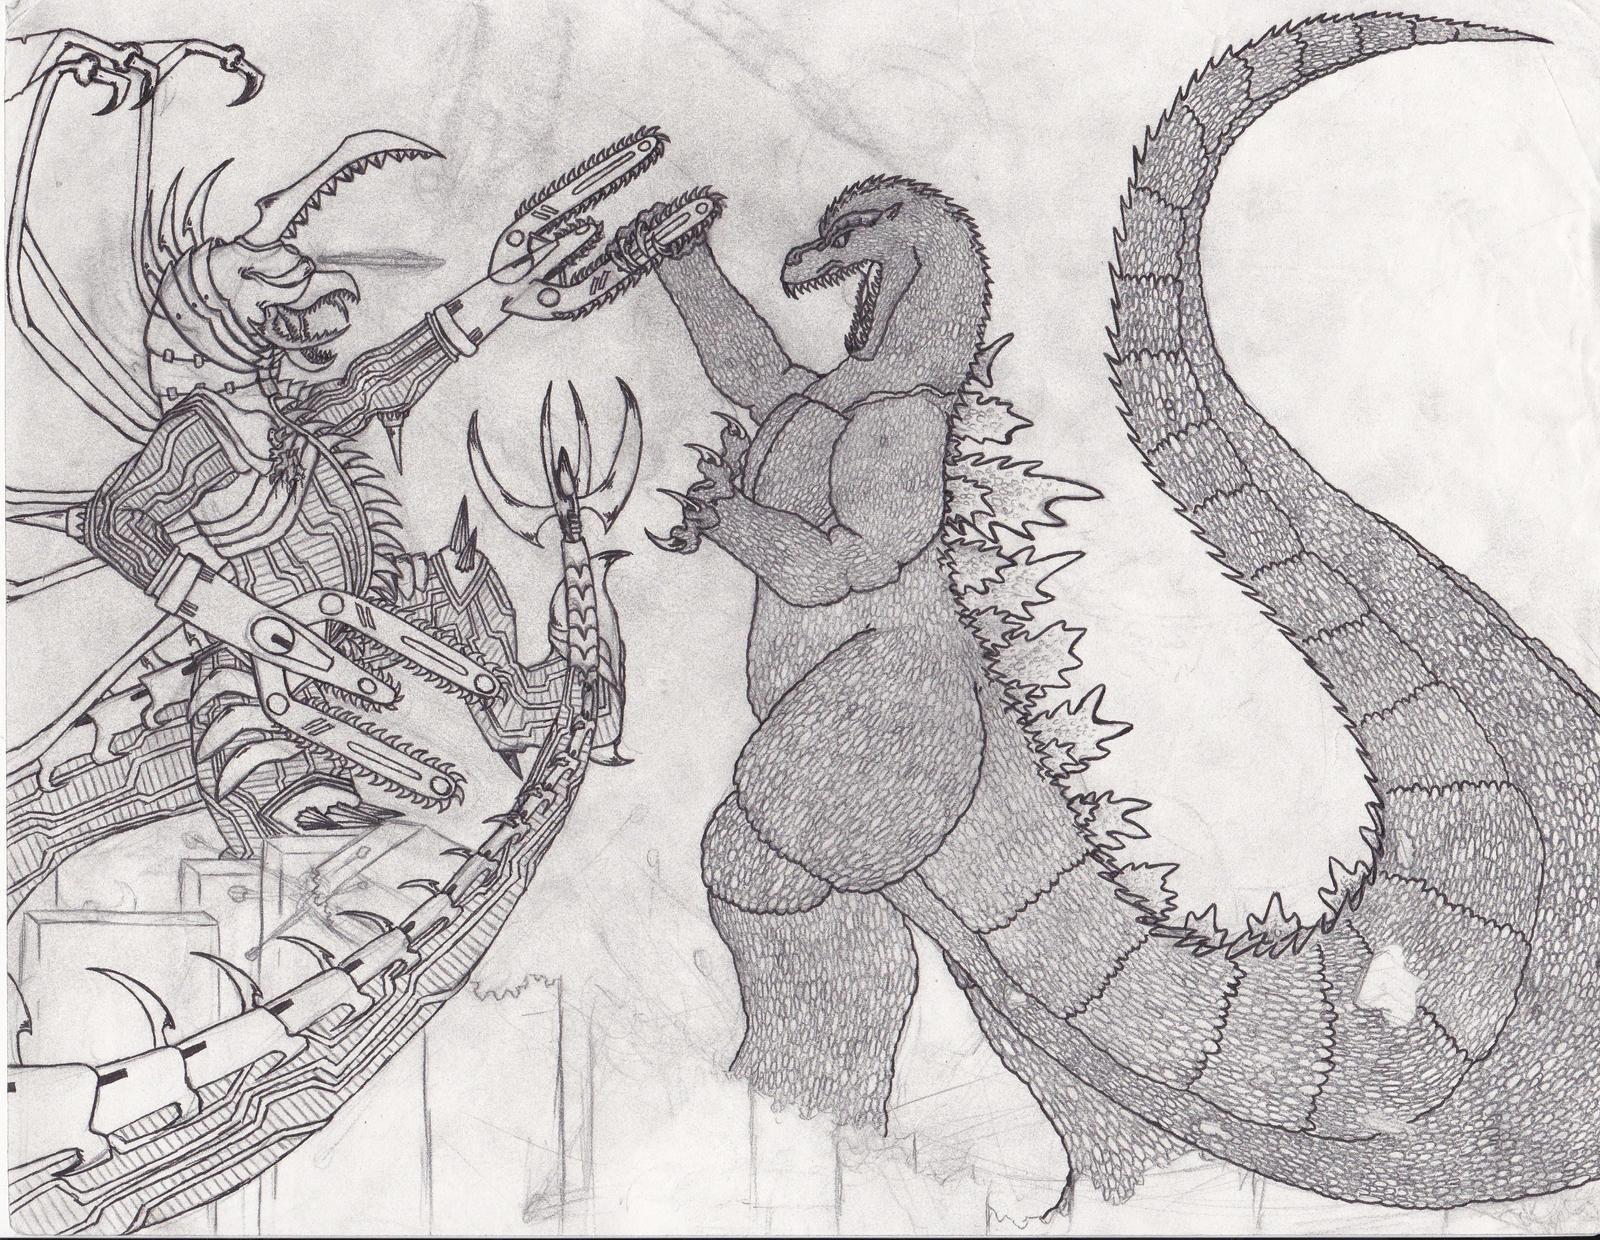 art trade 1 godzilla vs gigan fw sketch by burningg hellonearth